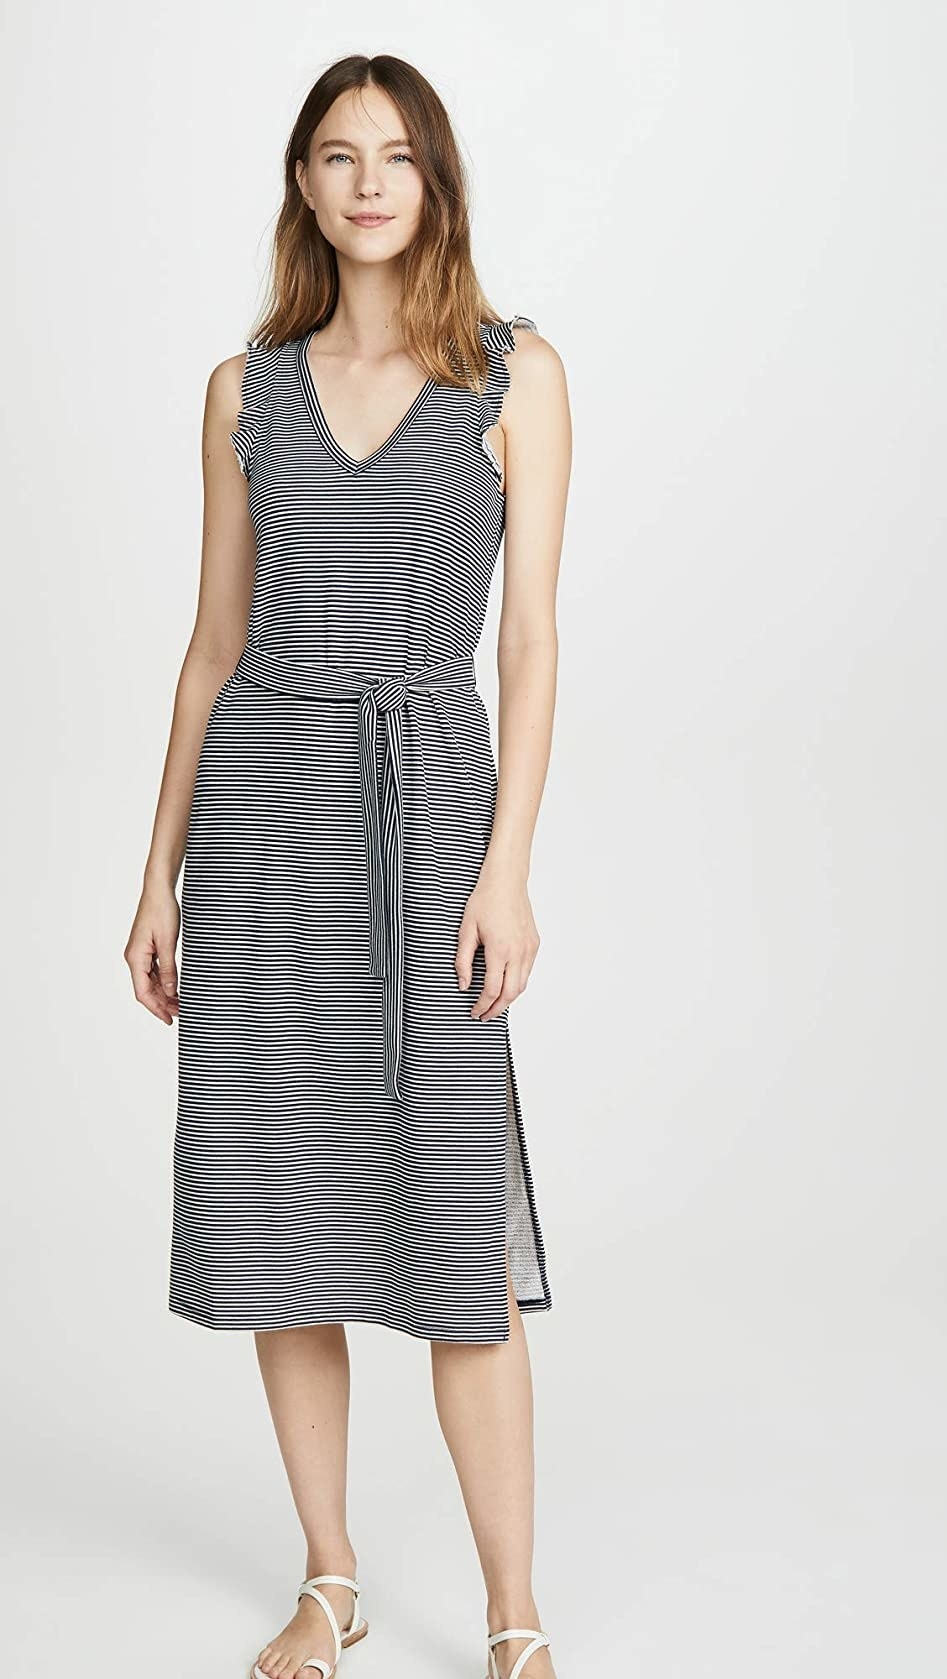 The sleeveless striped midi dress